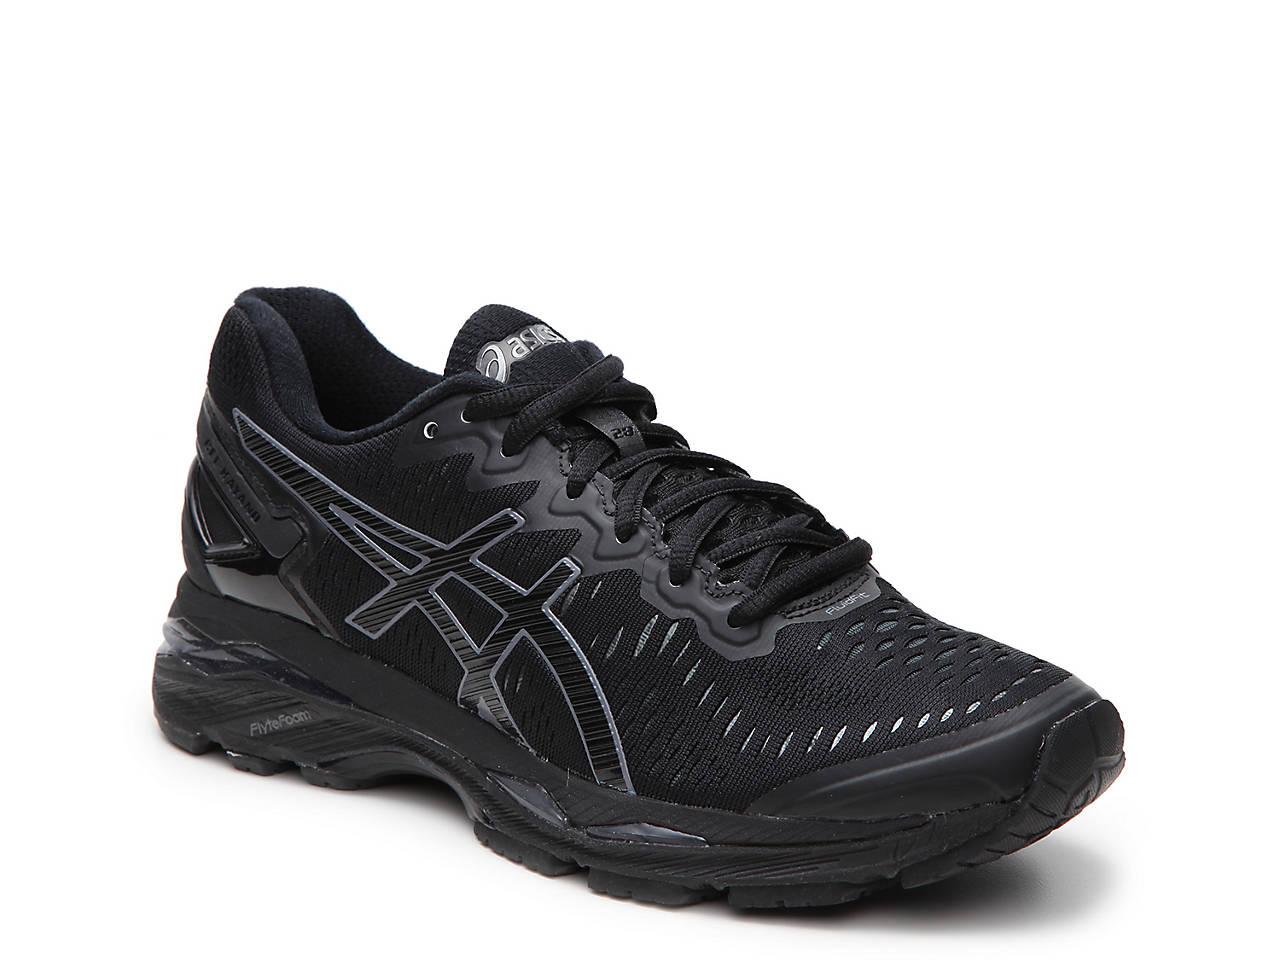 hot sale online f15a0 aff20 GEL-Kayano 23 Performance Running Shoe - Women's